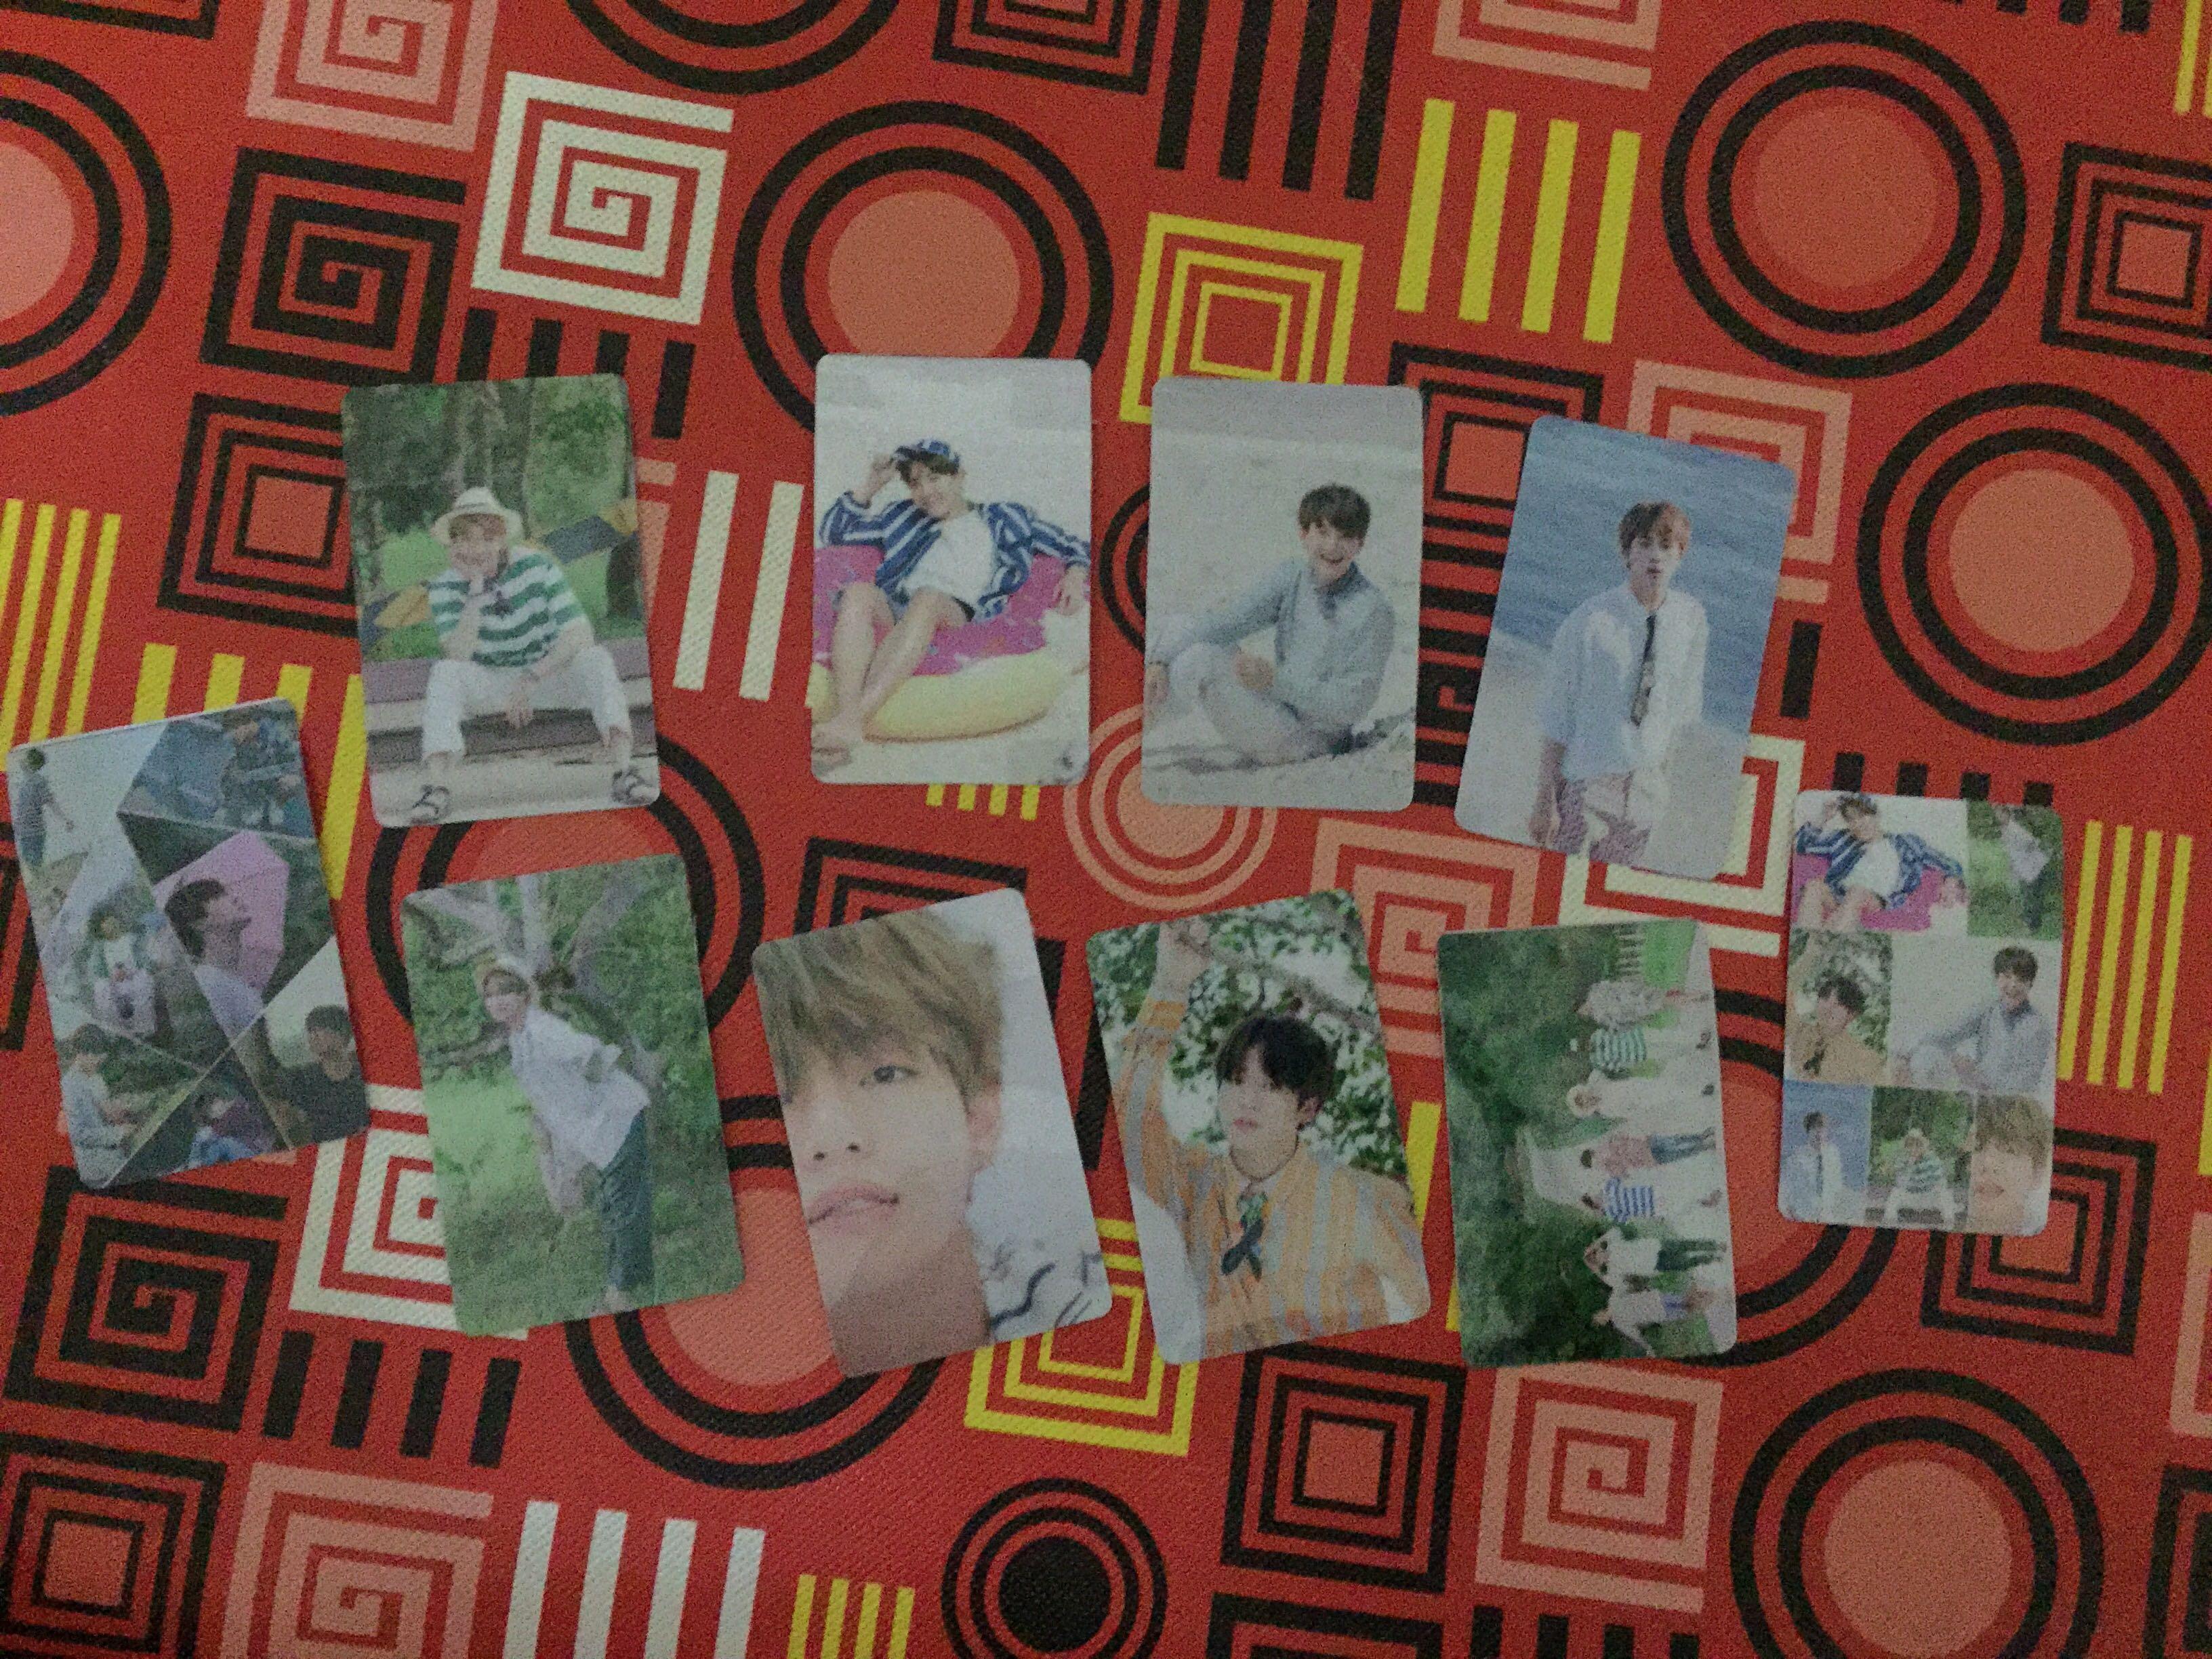 BTS Lomo Card, Bts Transparent Card, BTS acrylic cards.